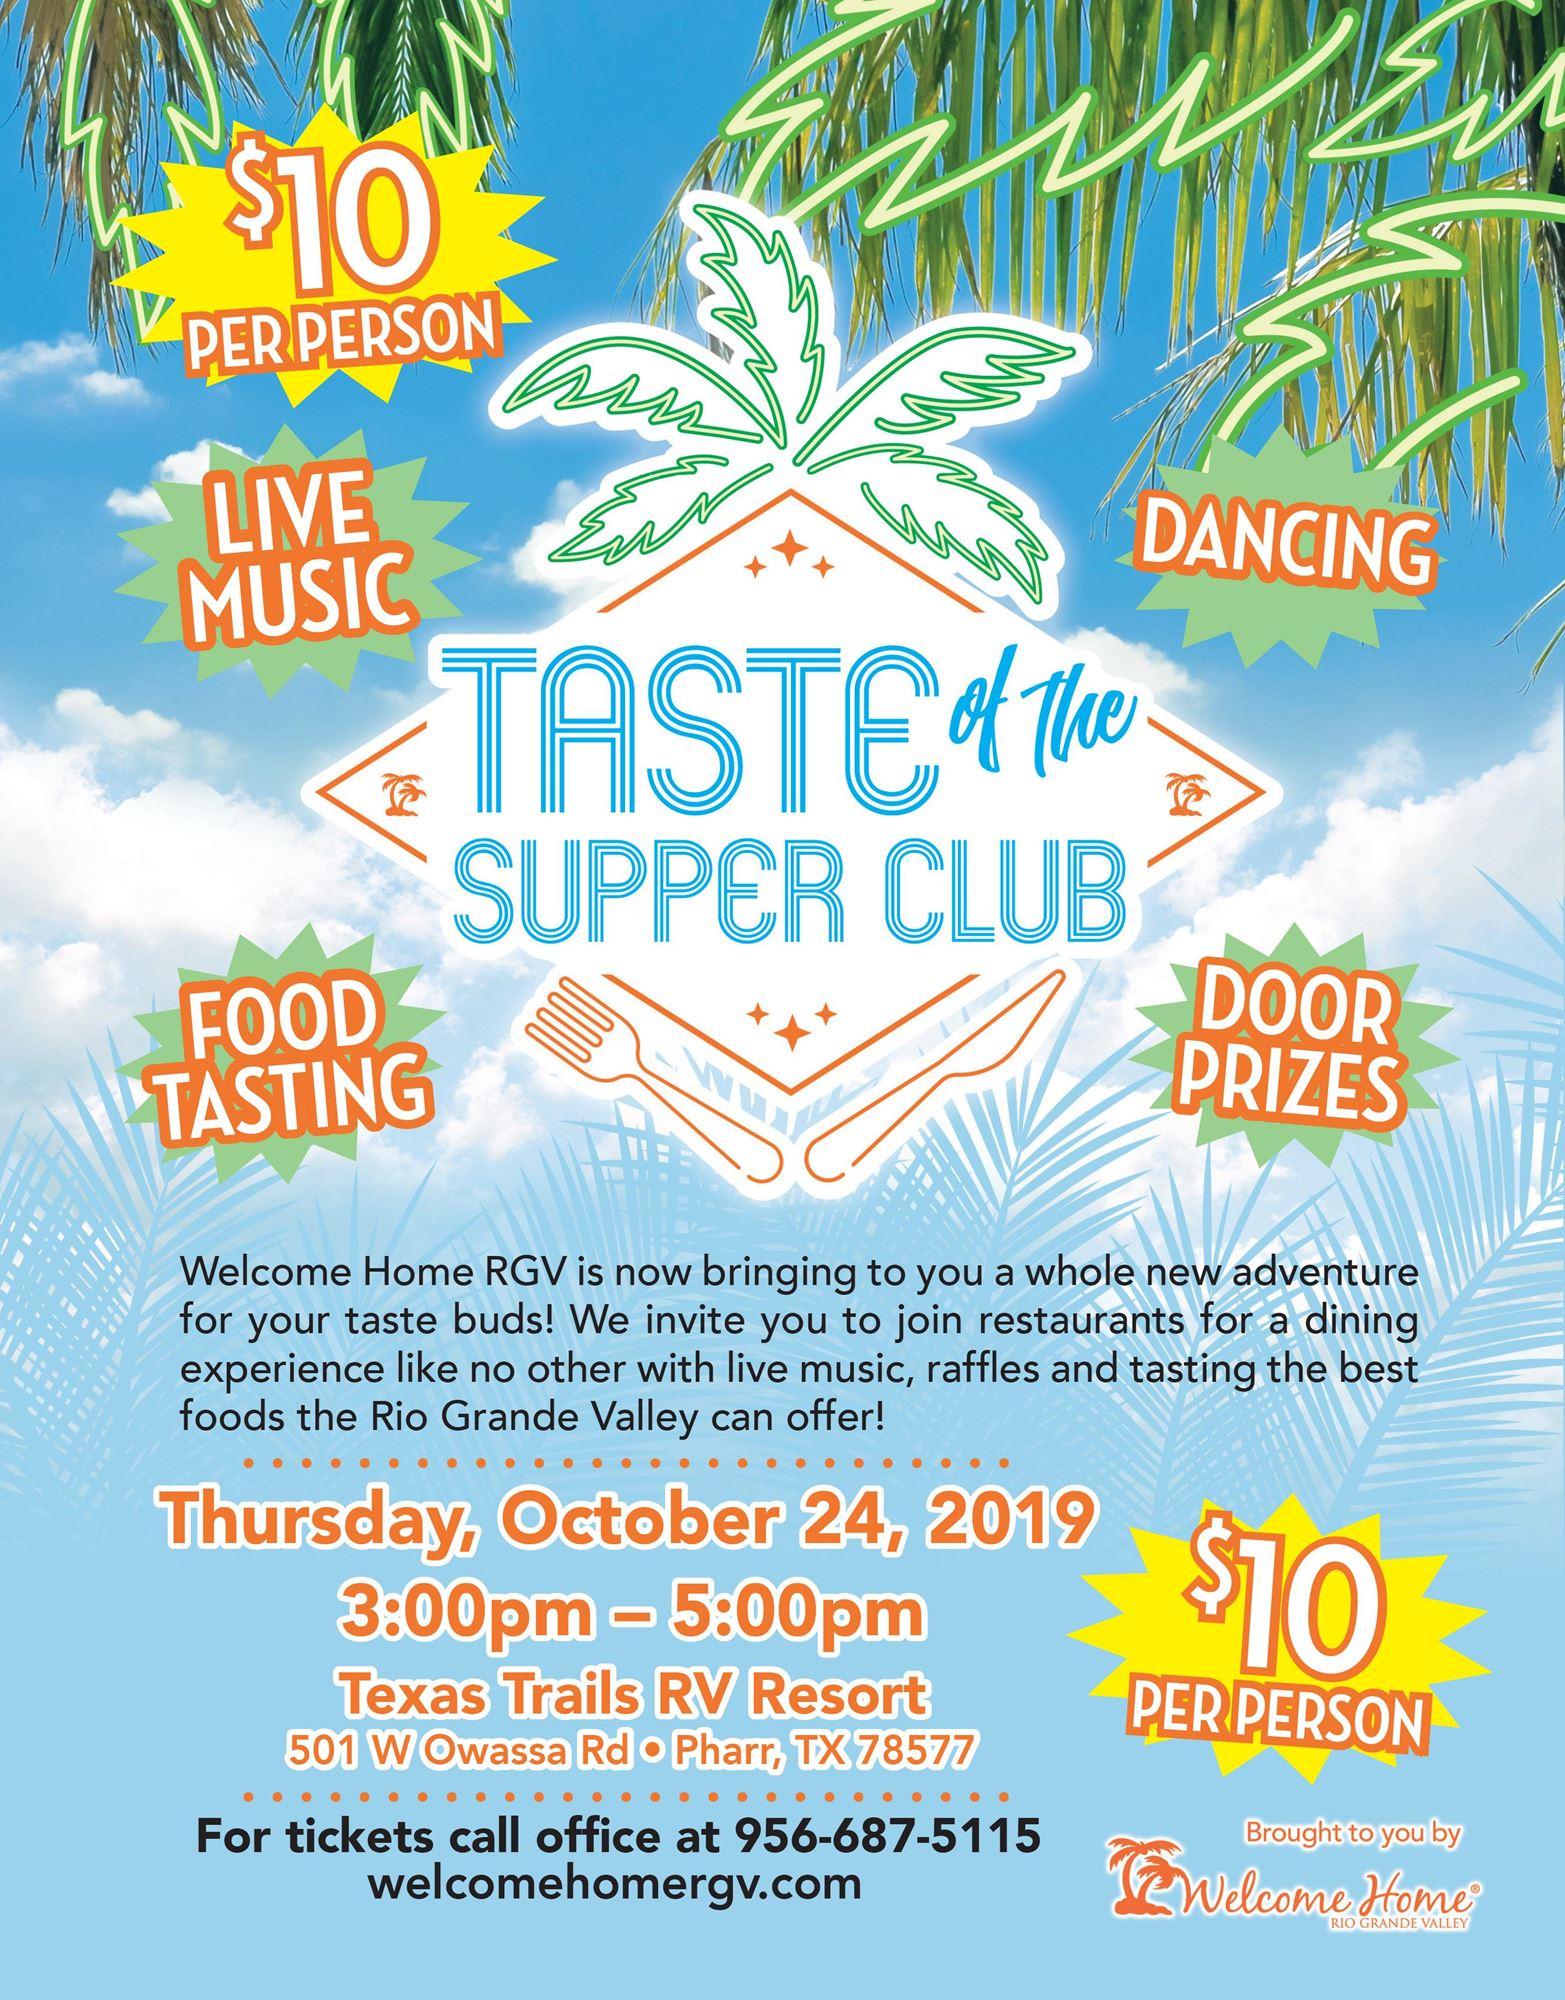 TASTE of Supper Club